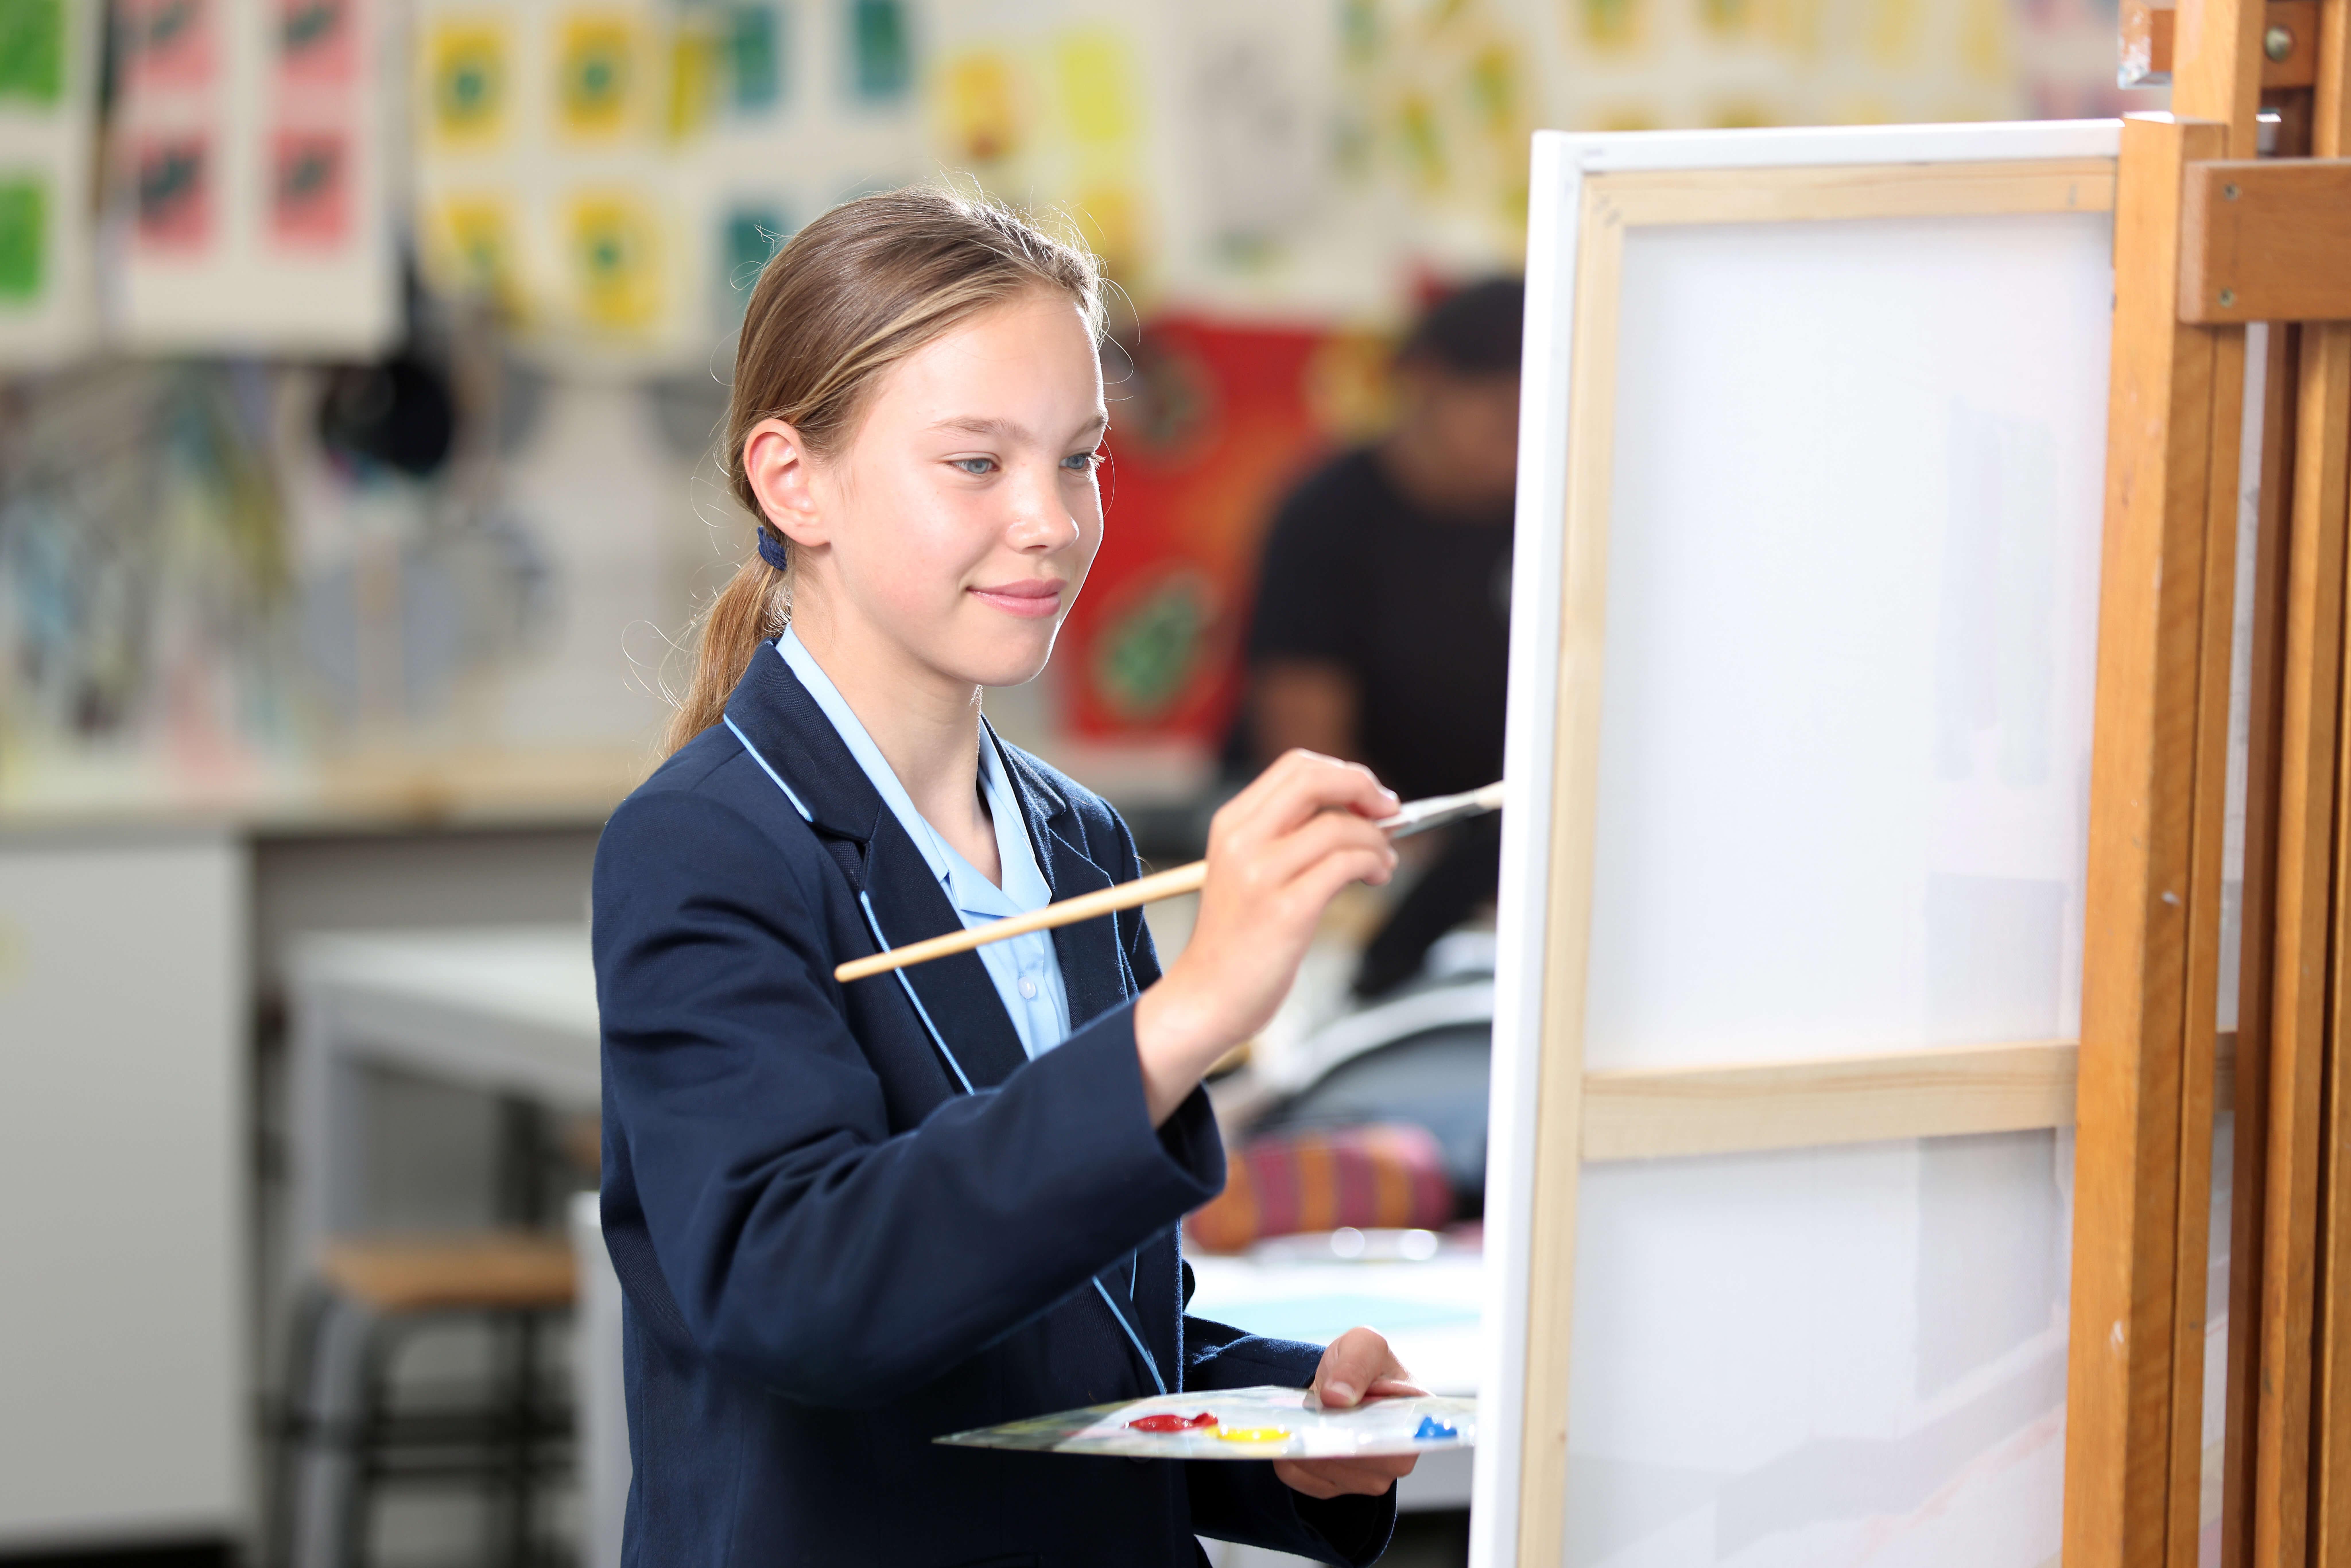 Headington School, Oxford: Creative and innovative education for the 21st century